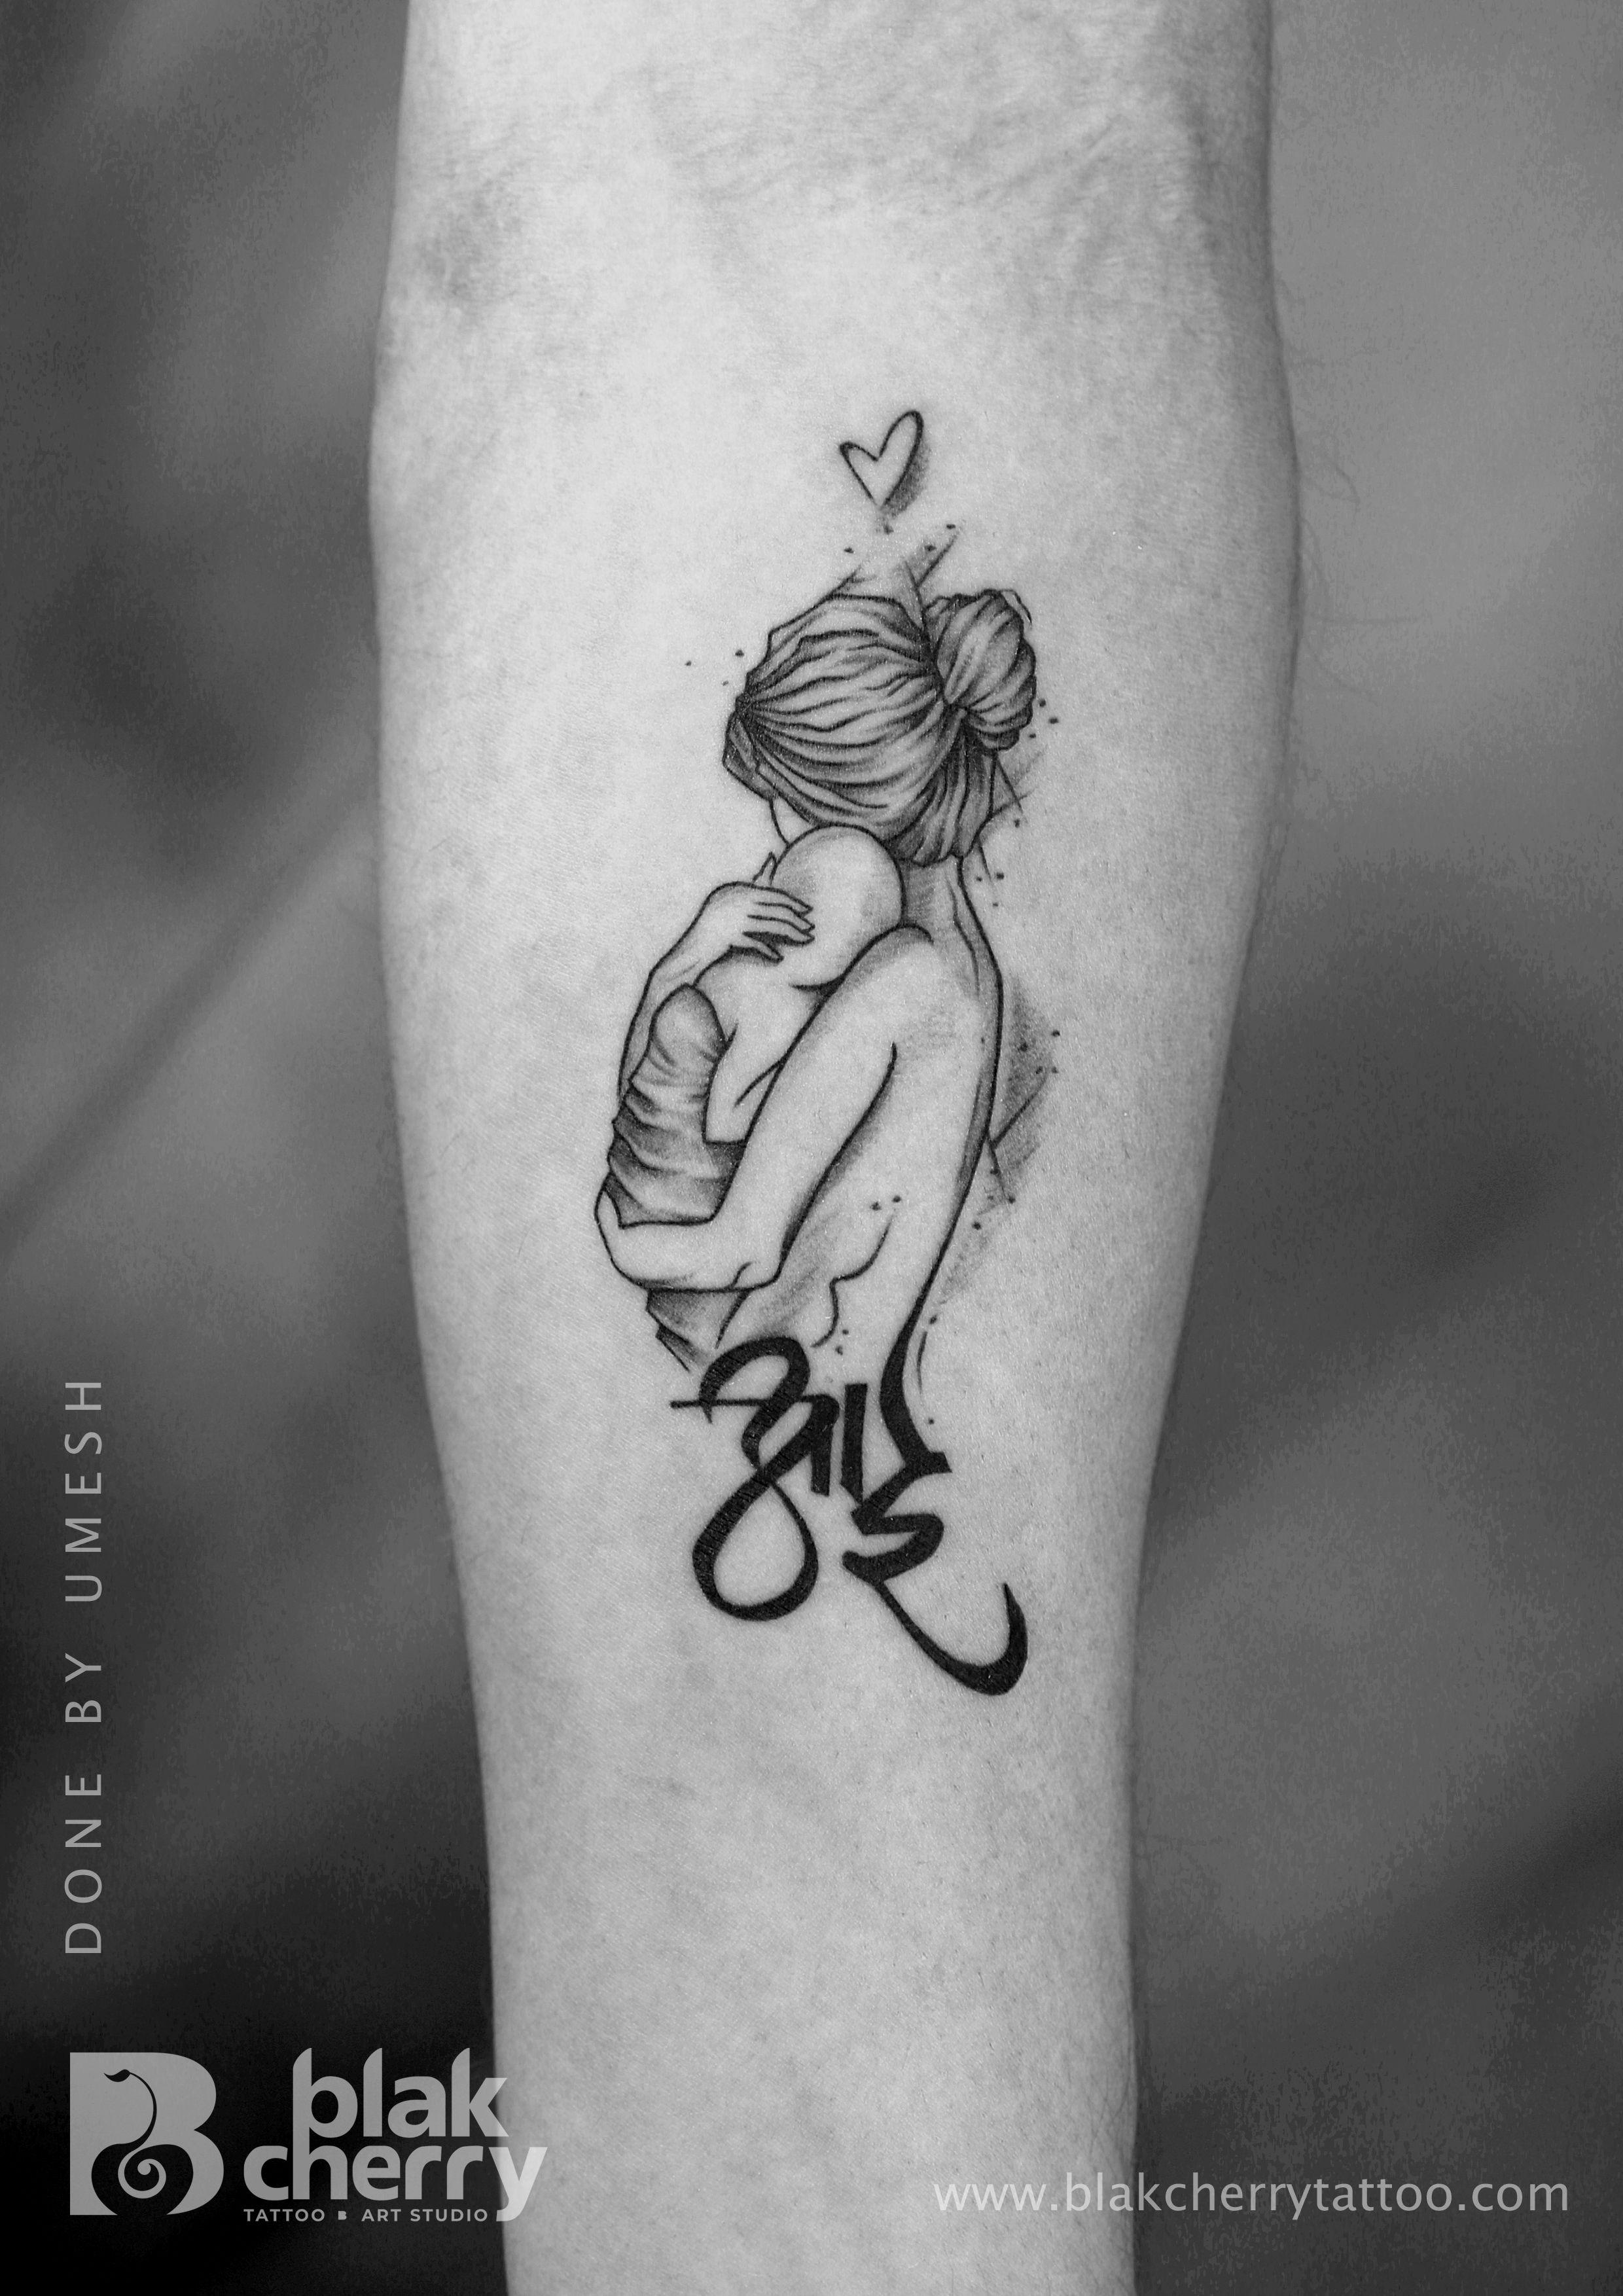 ed16425a5 Mother tattoo . #aai tattoo.#feelings.#daughter #blakcherry tattoo studio  #ahmednagar